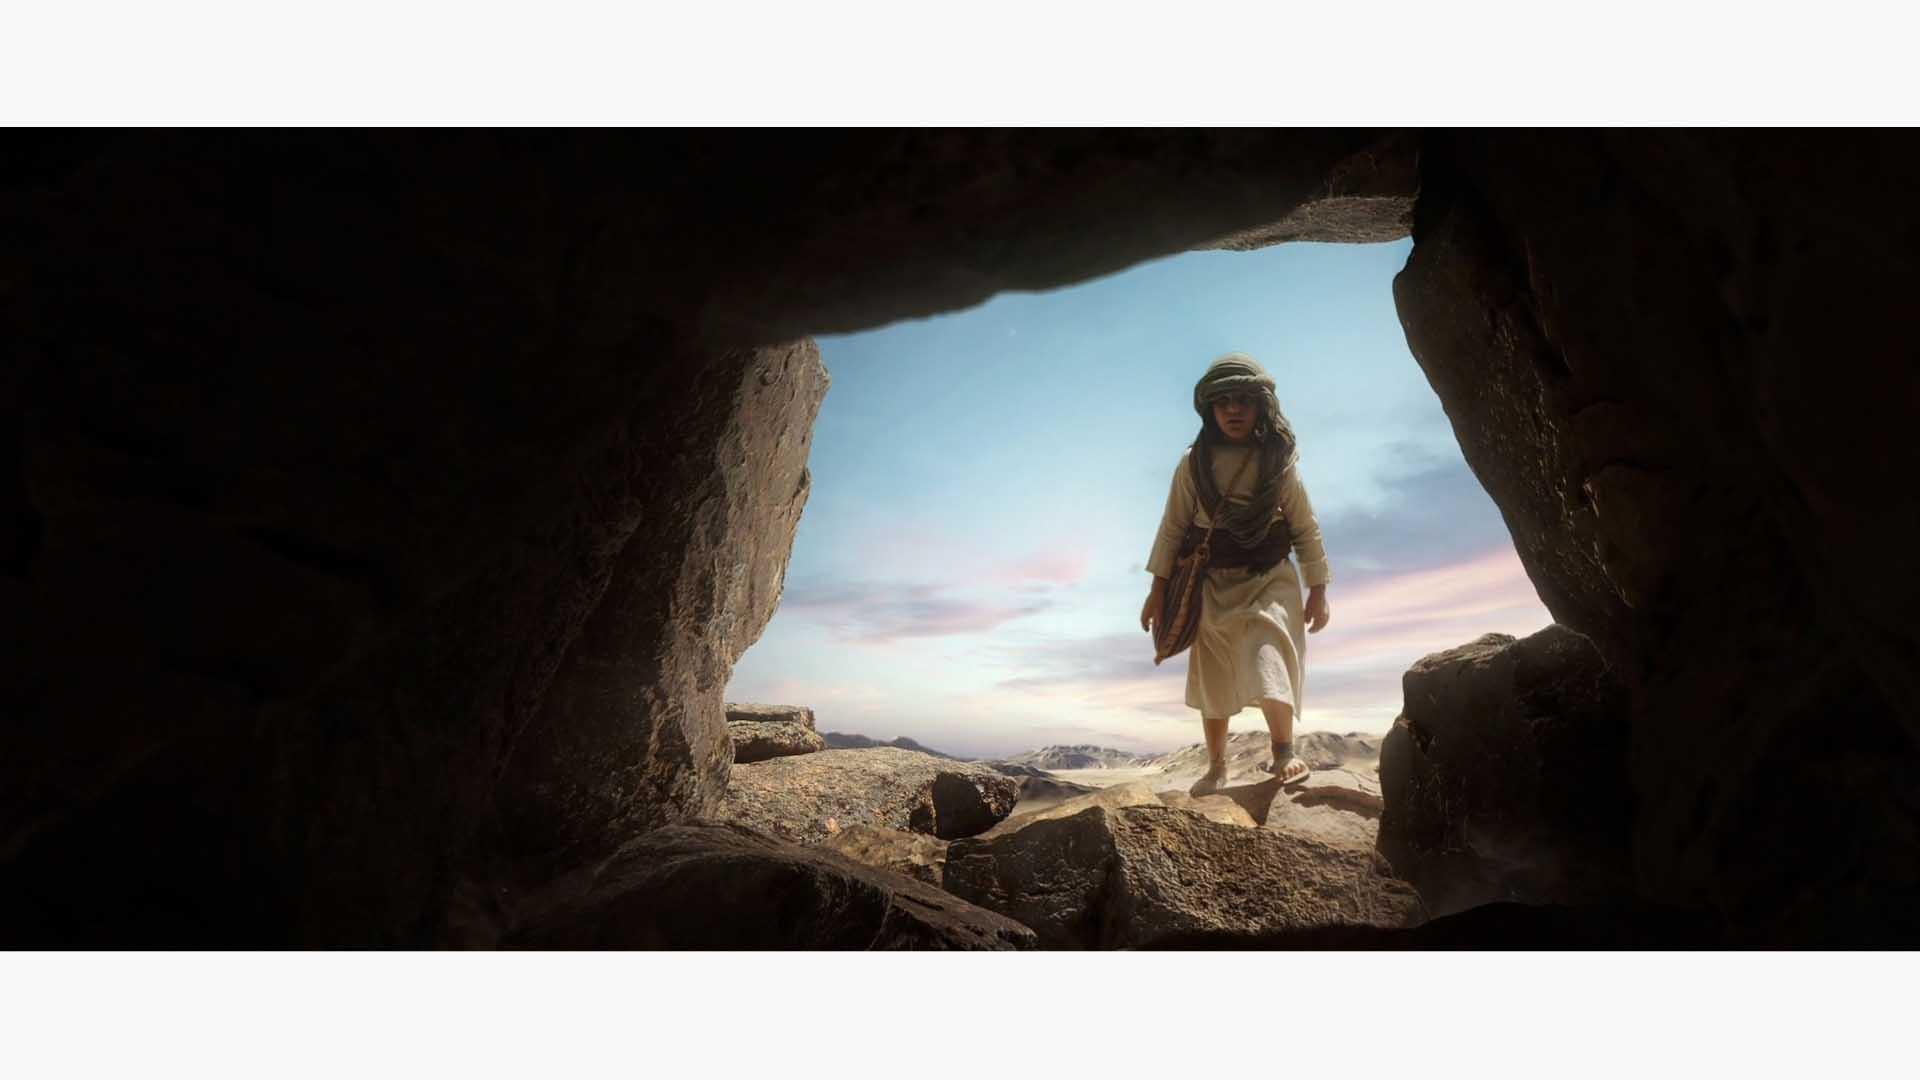 Abbas Yousefi عباس اليوسفي | نبأ السماء The Tale Of The Heavens